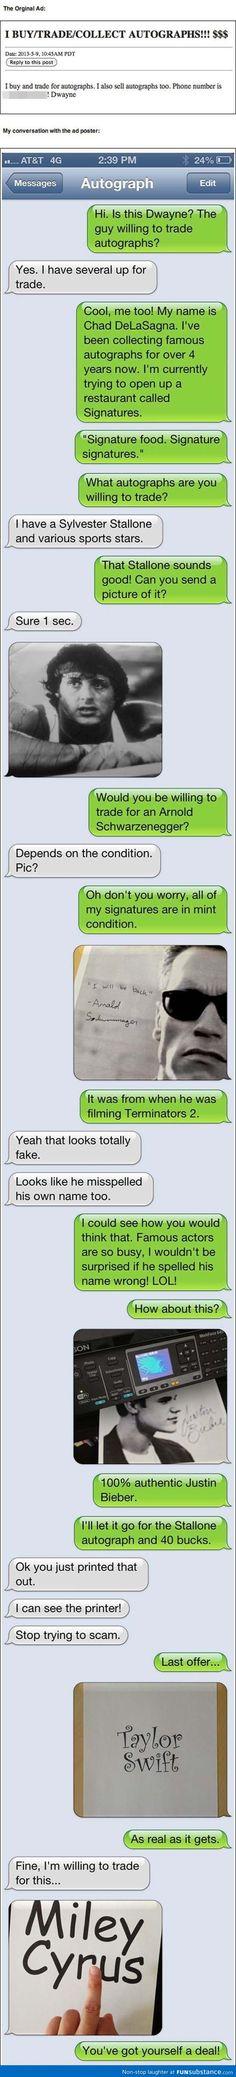 Craigslist troll